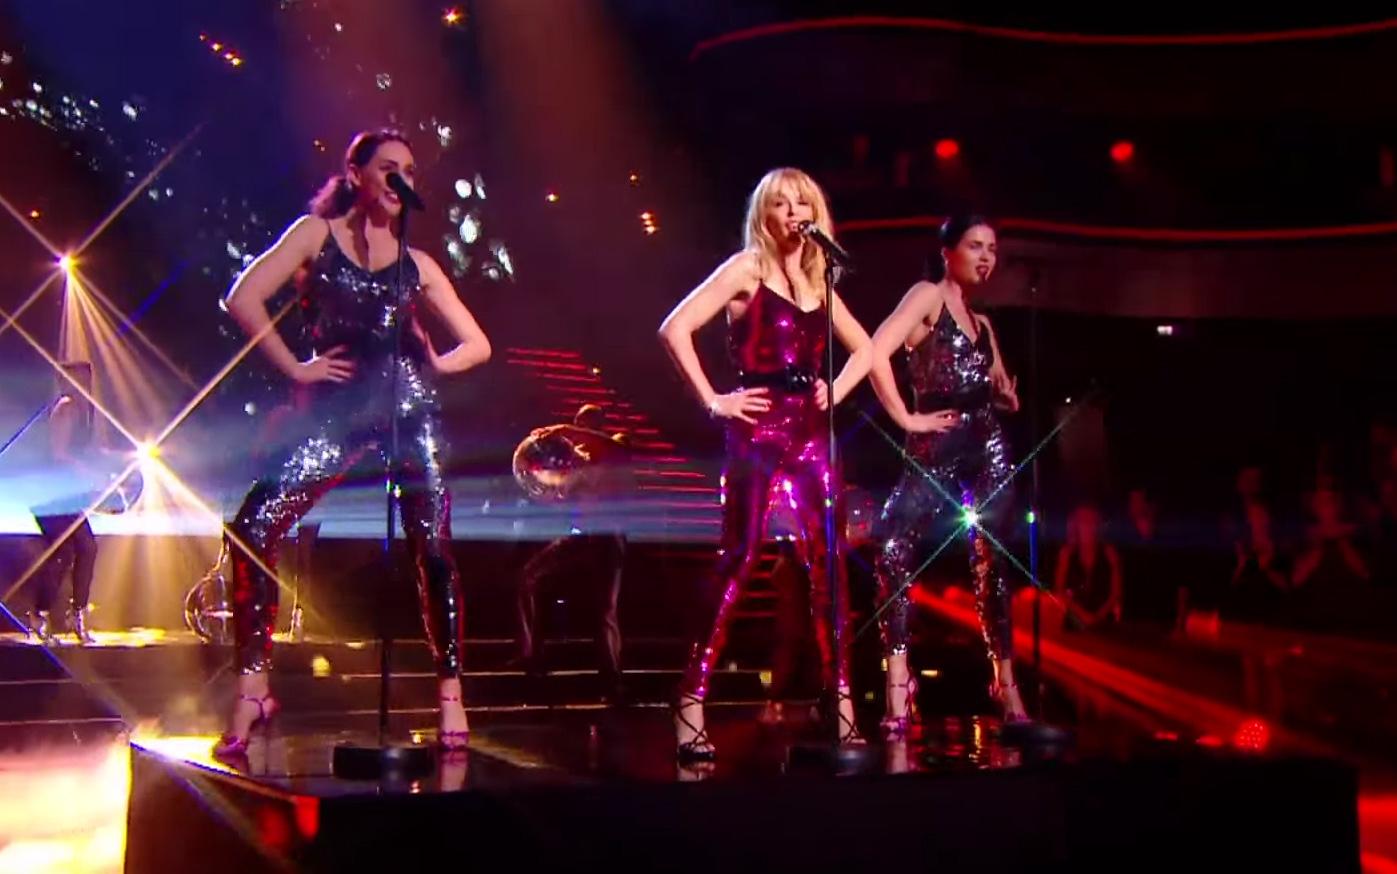 Битва нарядов: Loboda и Кайли Миноуг в комбинезоне Yves Saint Laurent